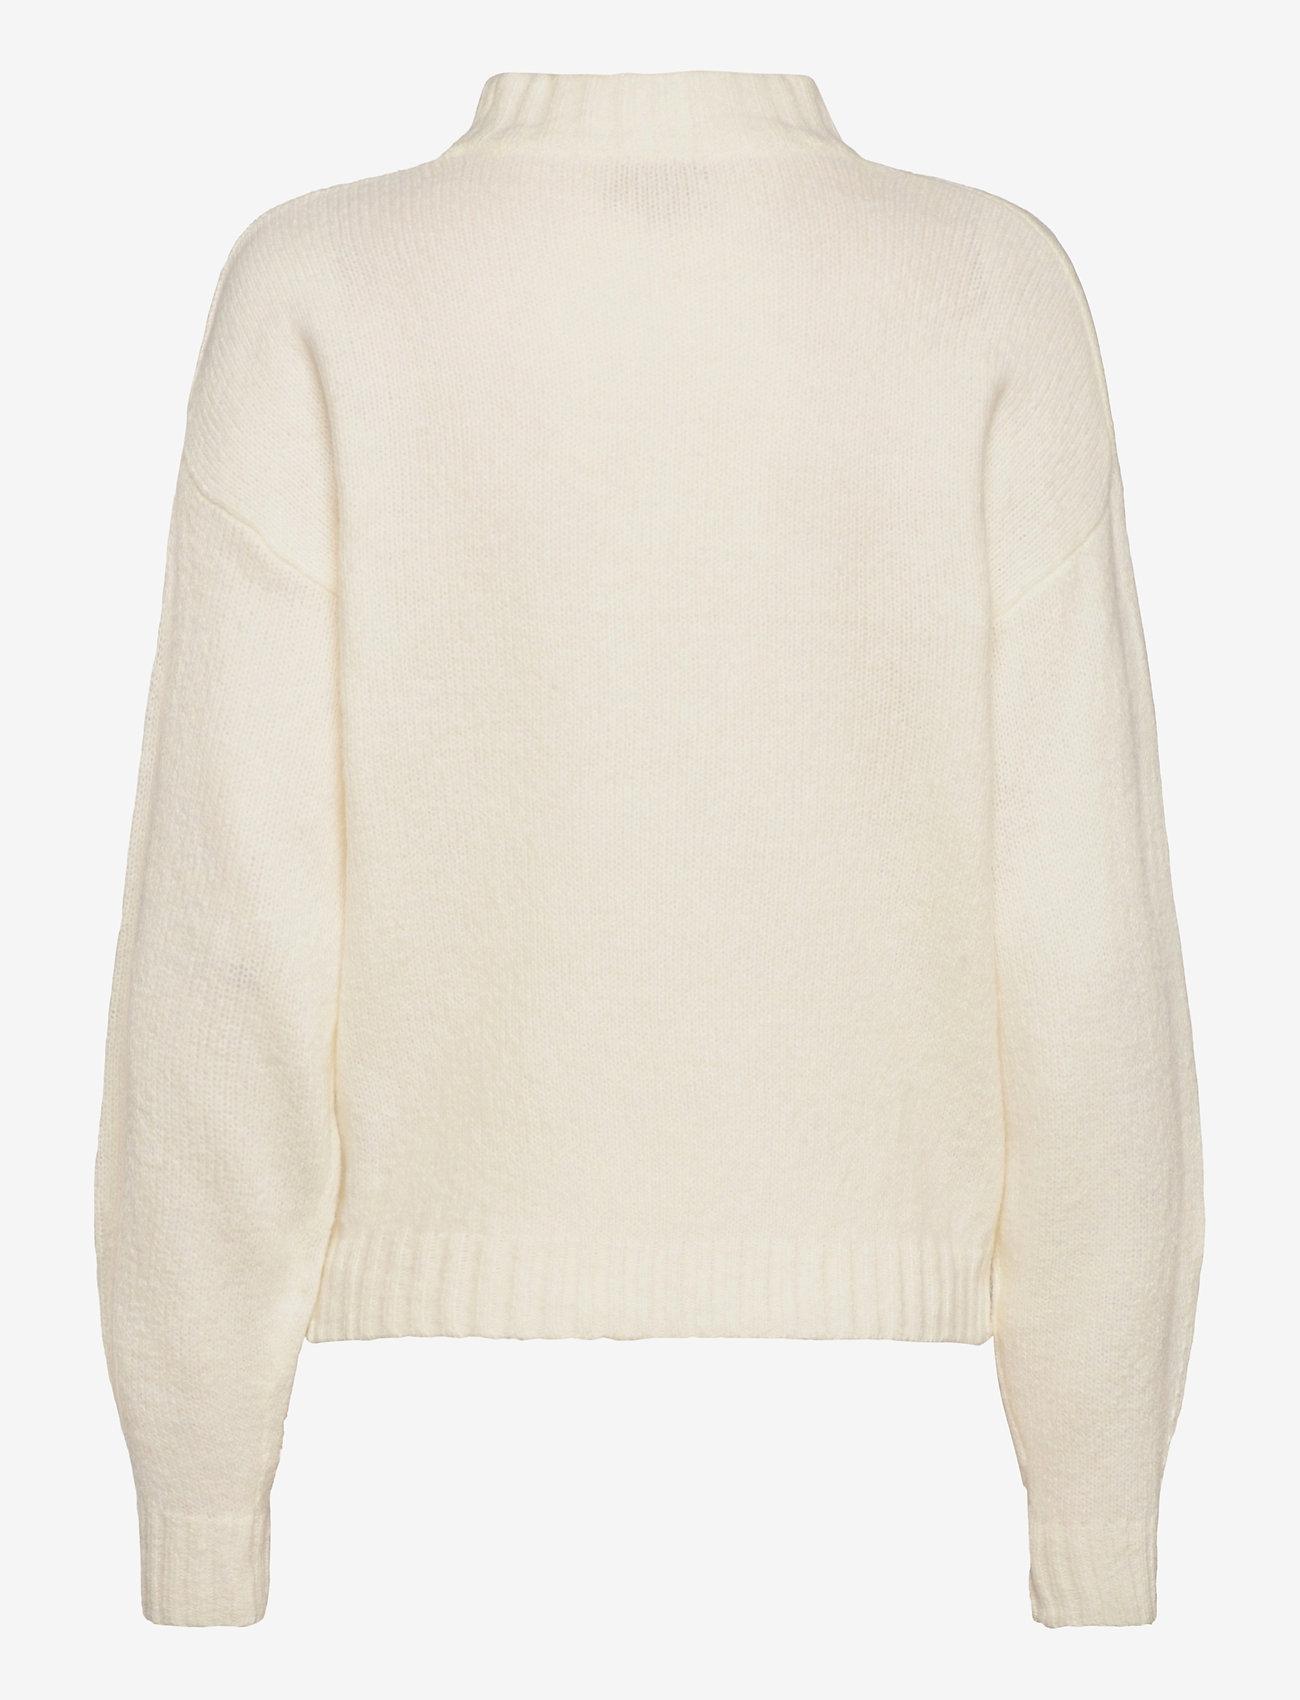 Kala Knit Pullover (Broken White) (79.95 €) - Minus MaivT